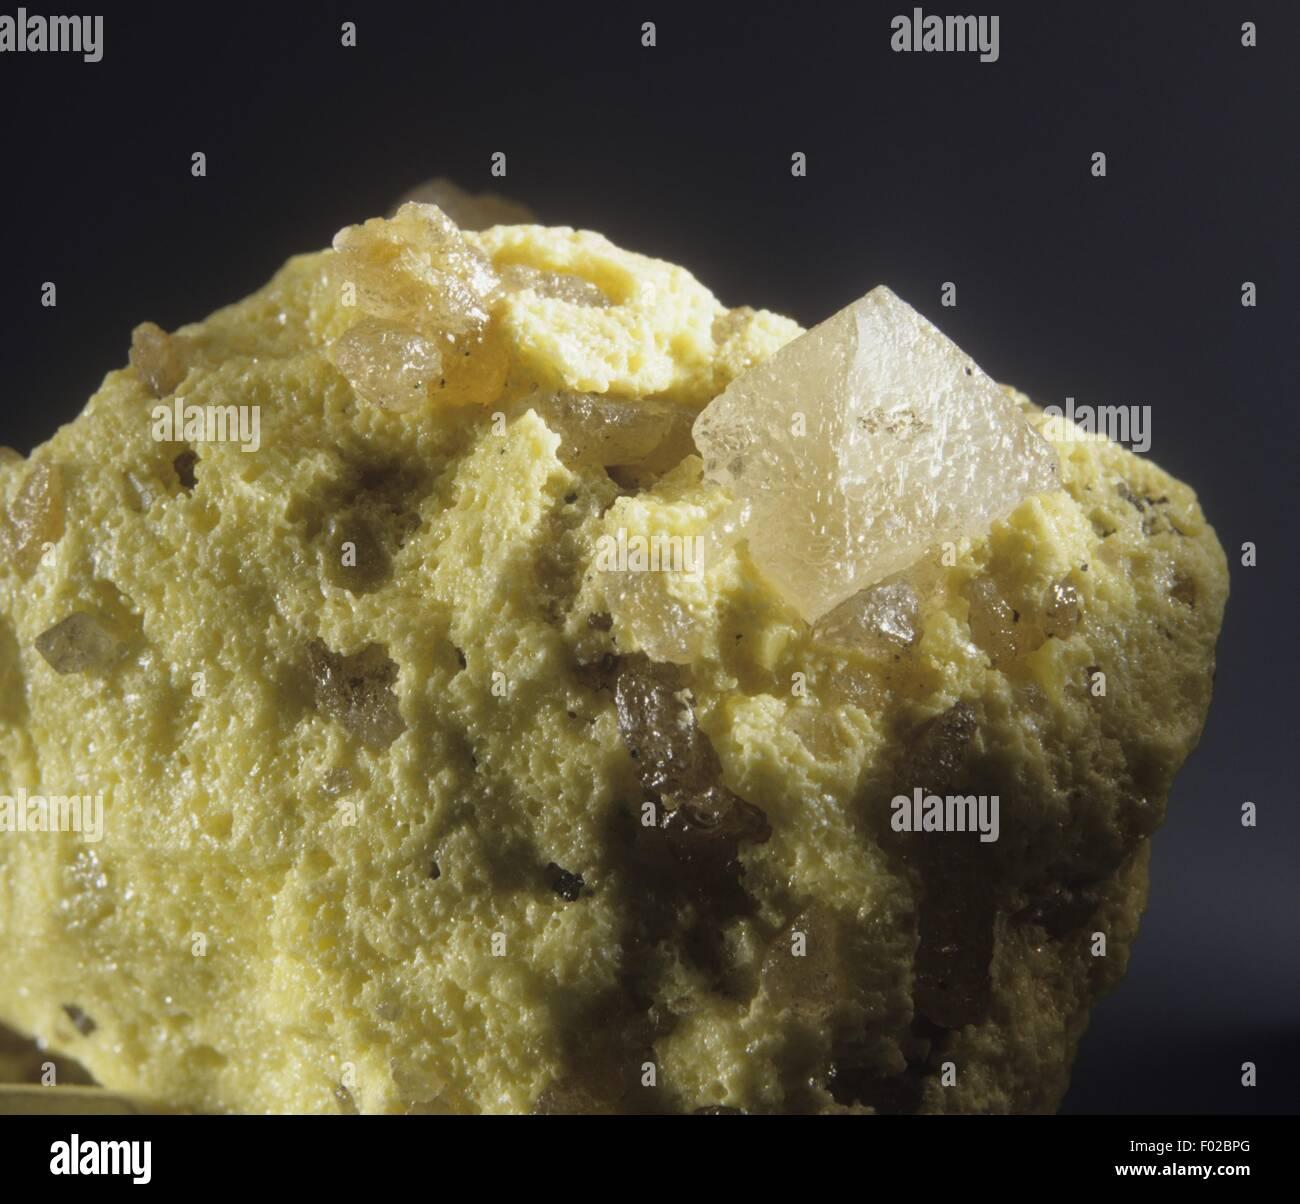 Anglesite, close-up - Stock Image